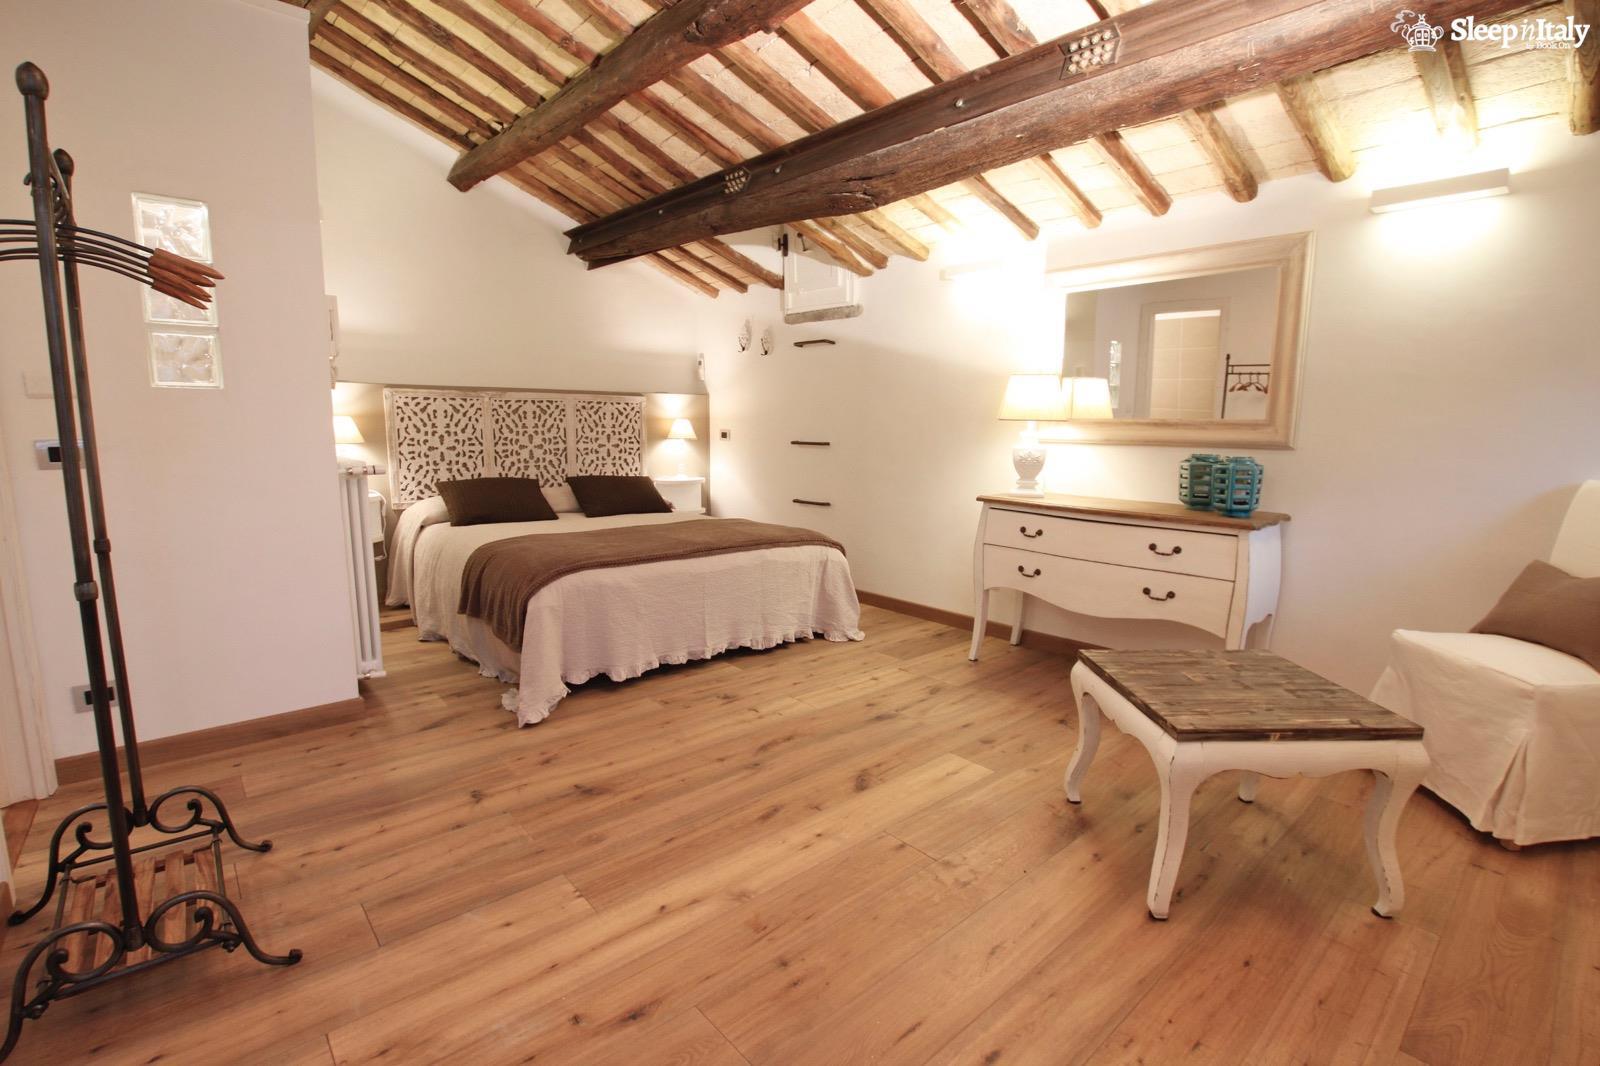 Roma in autunno casa in affitto maria laura berlinguer for Case in affitto roma